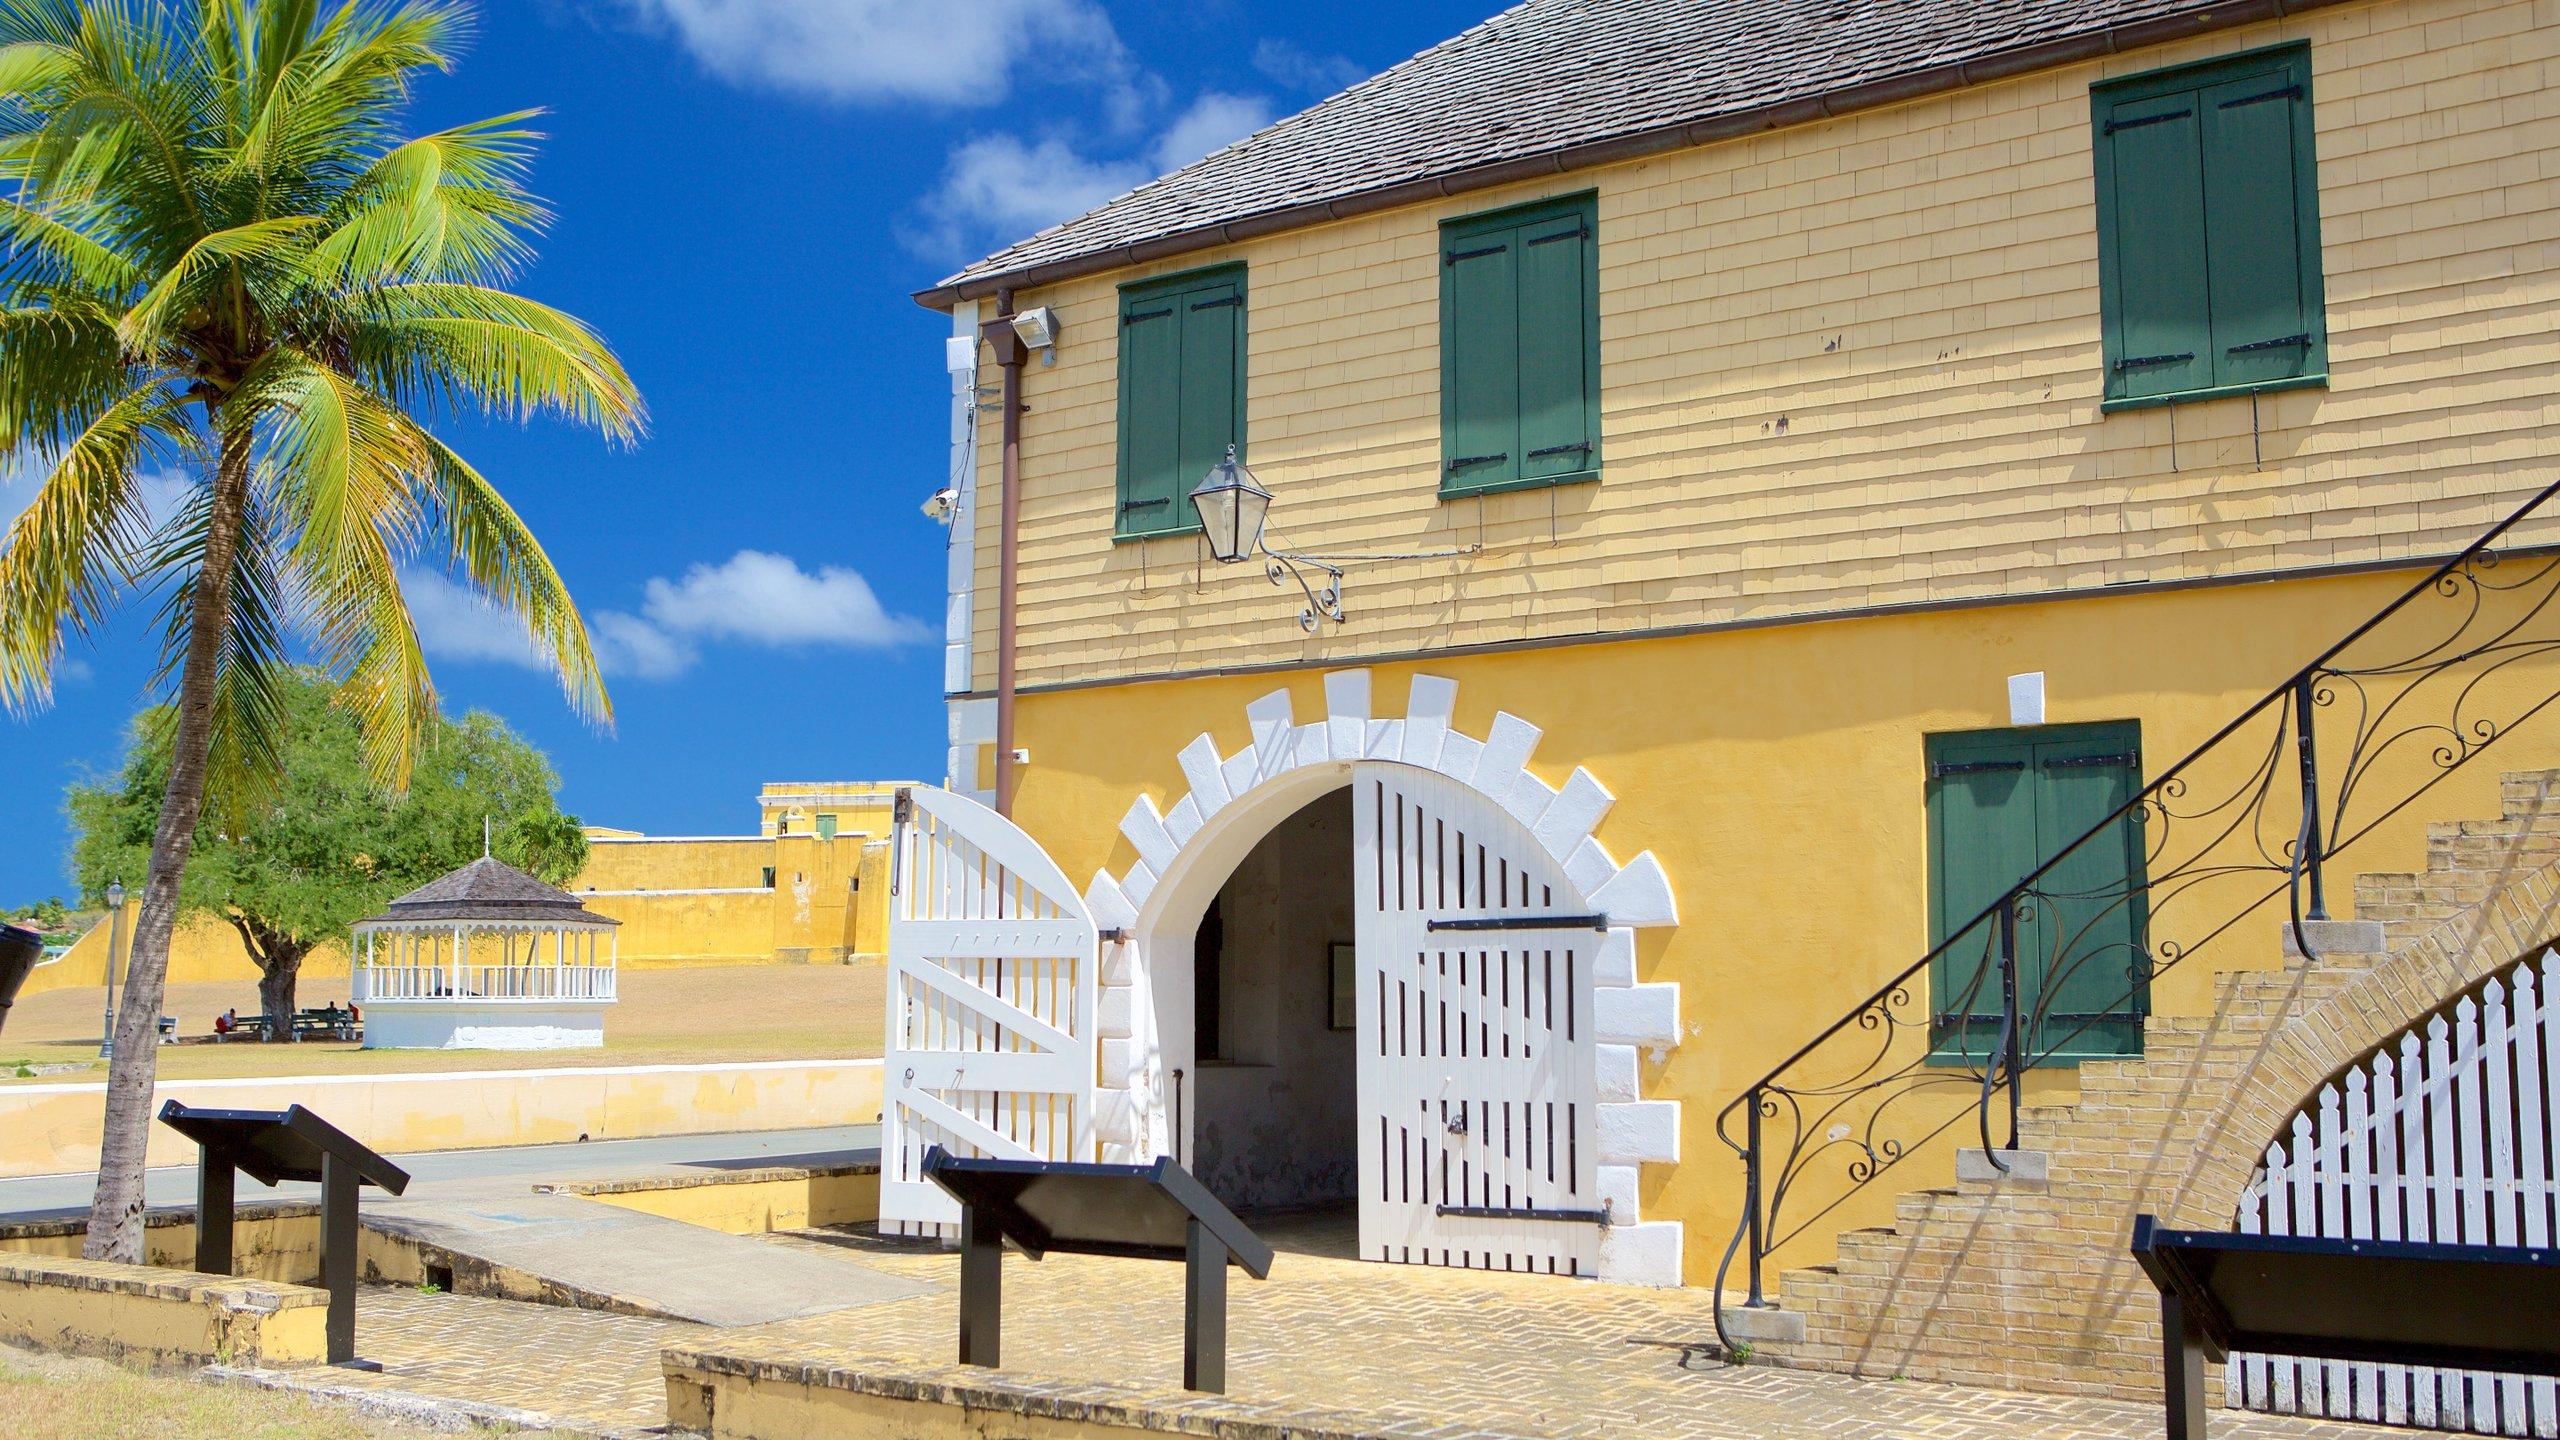 Scale House, Christiansted, St. Croix Island, U.S. Virgin Islands